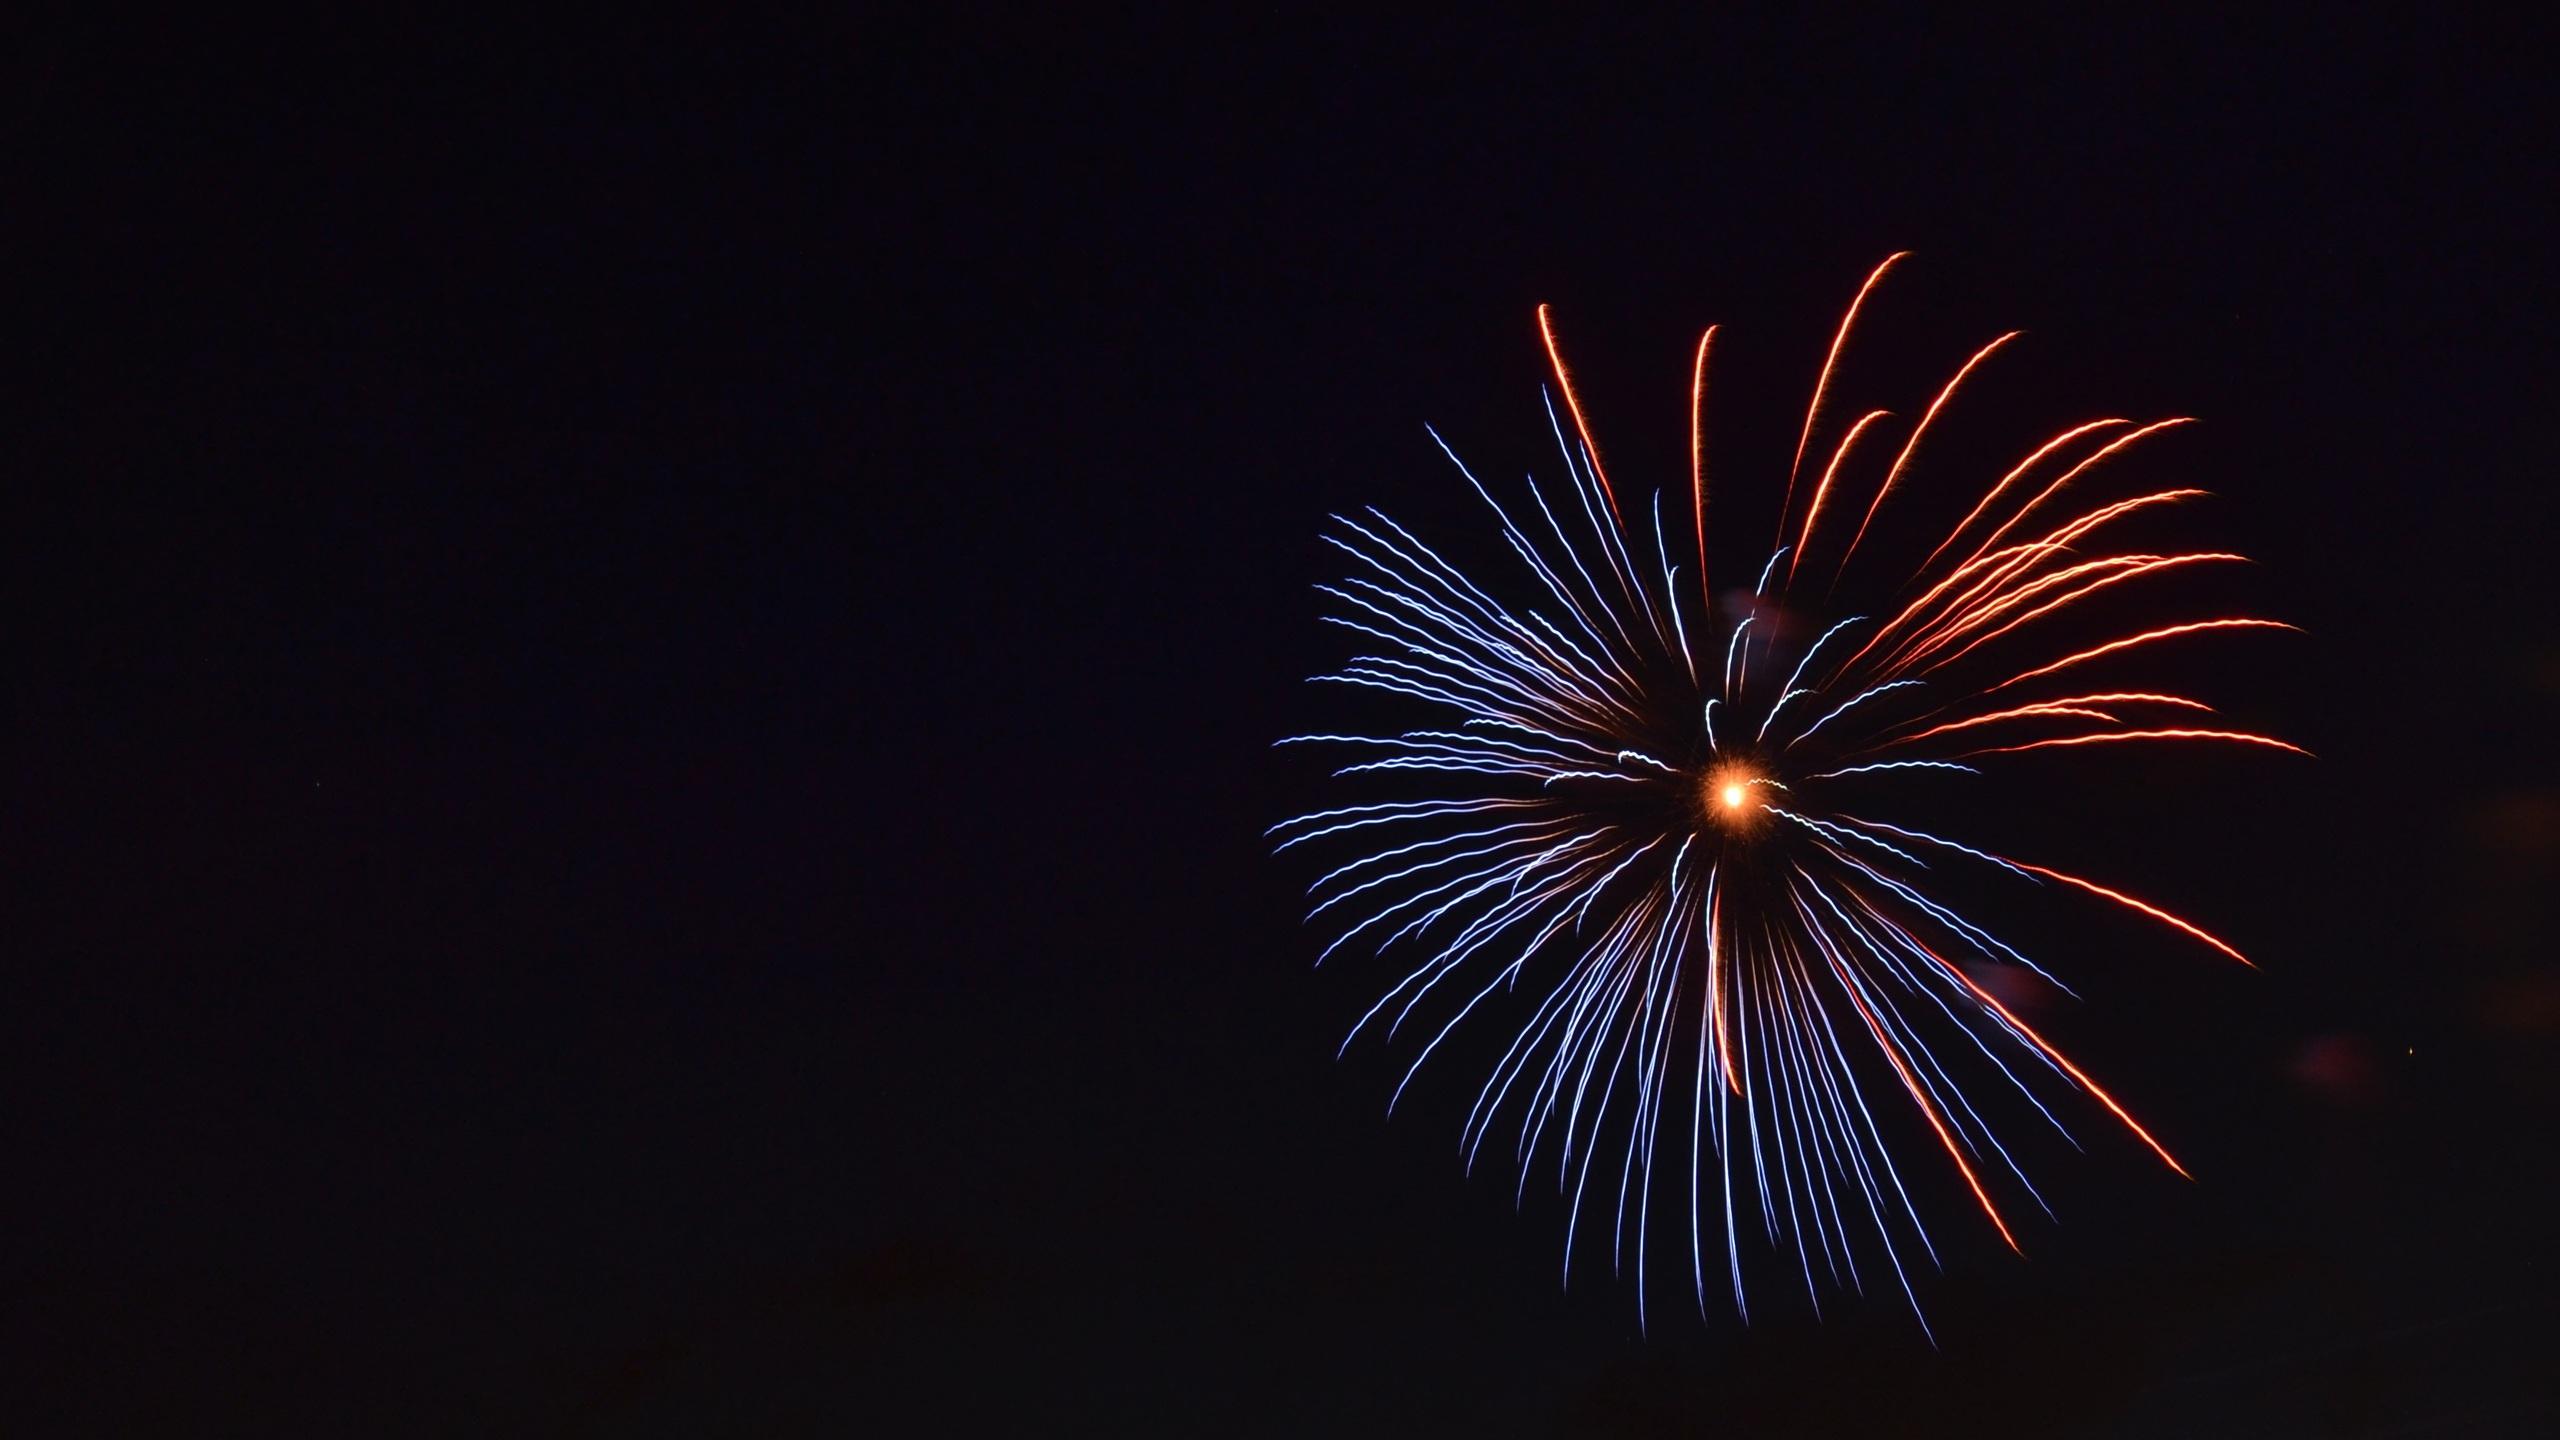 fireworks-flare-up-gi.jpg